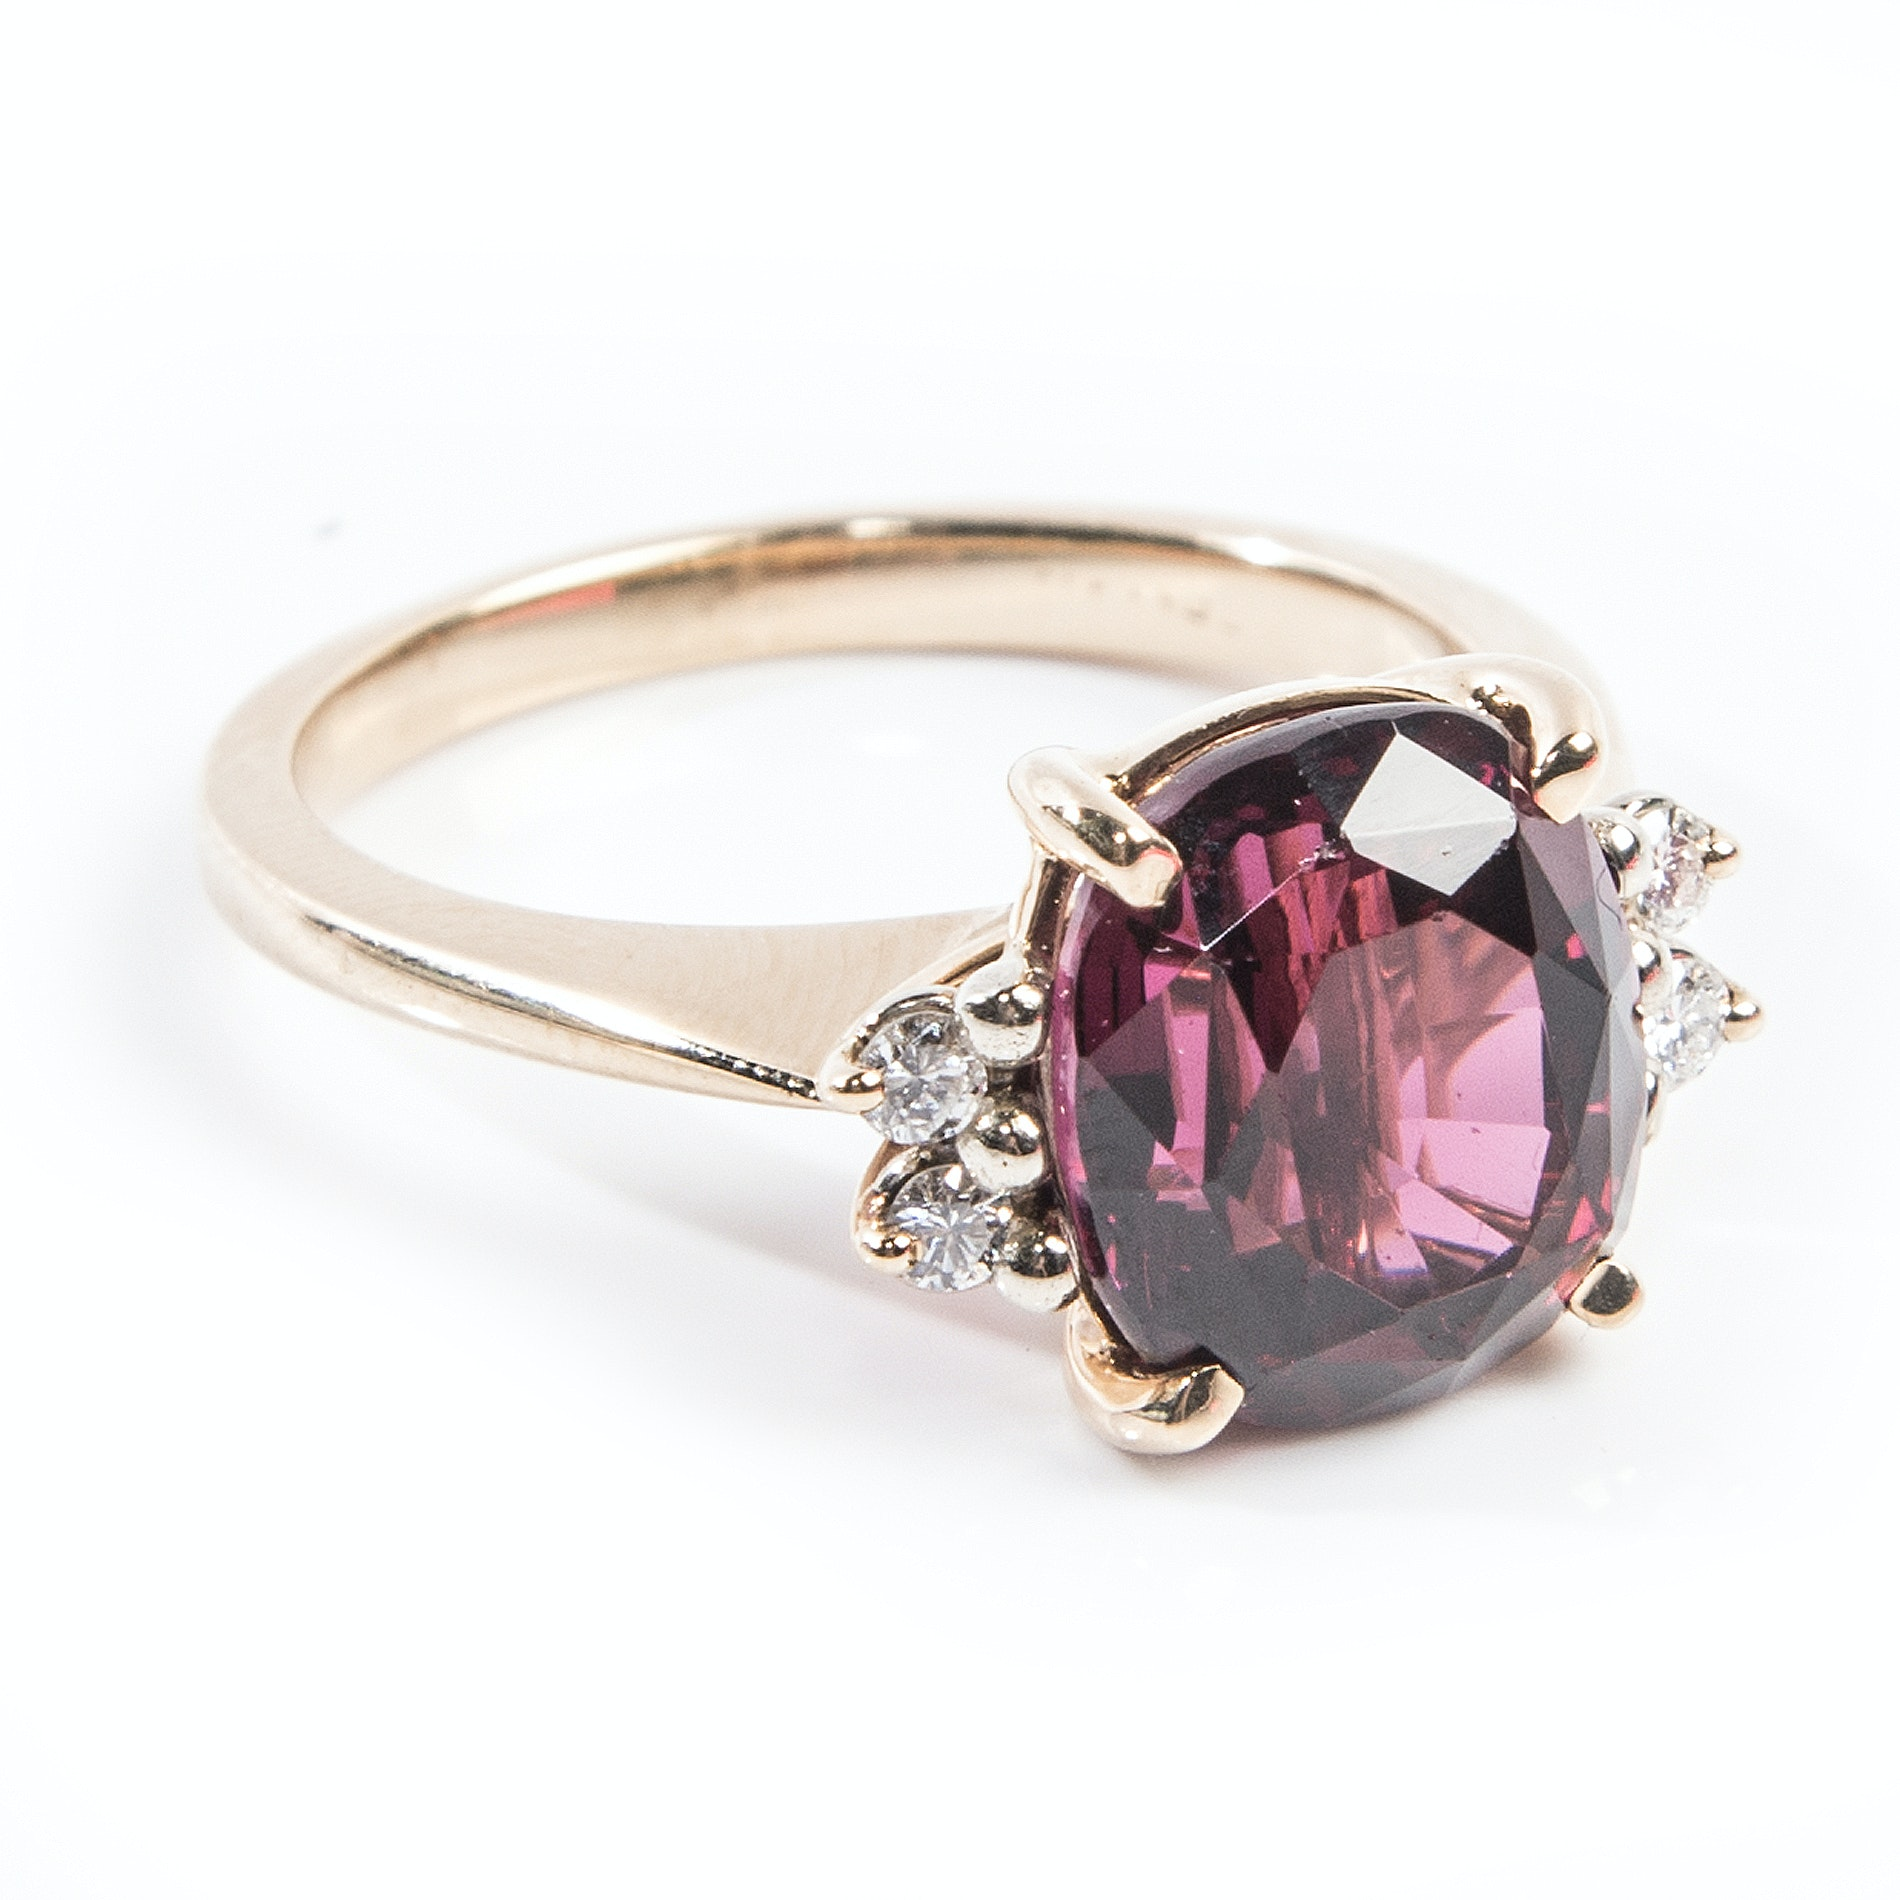 14K Yellow Gold 6.25 CTS Rhodolite Garnet and Diamond Ring